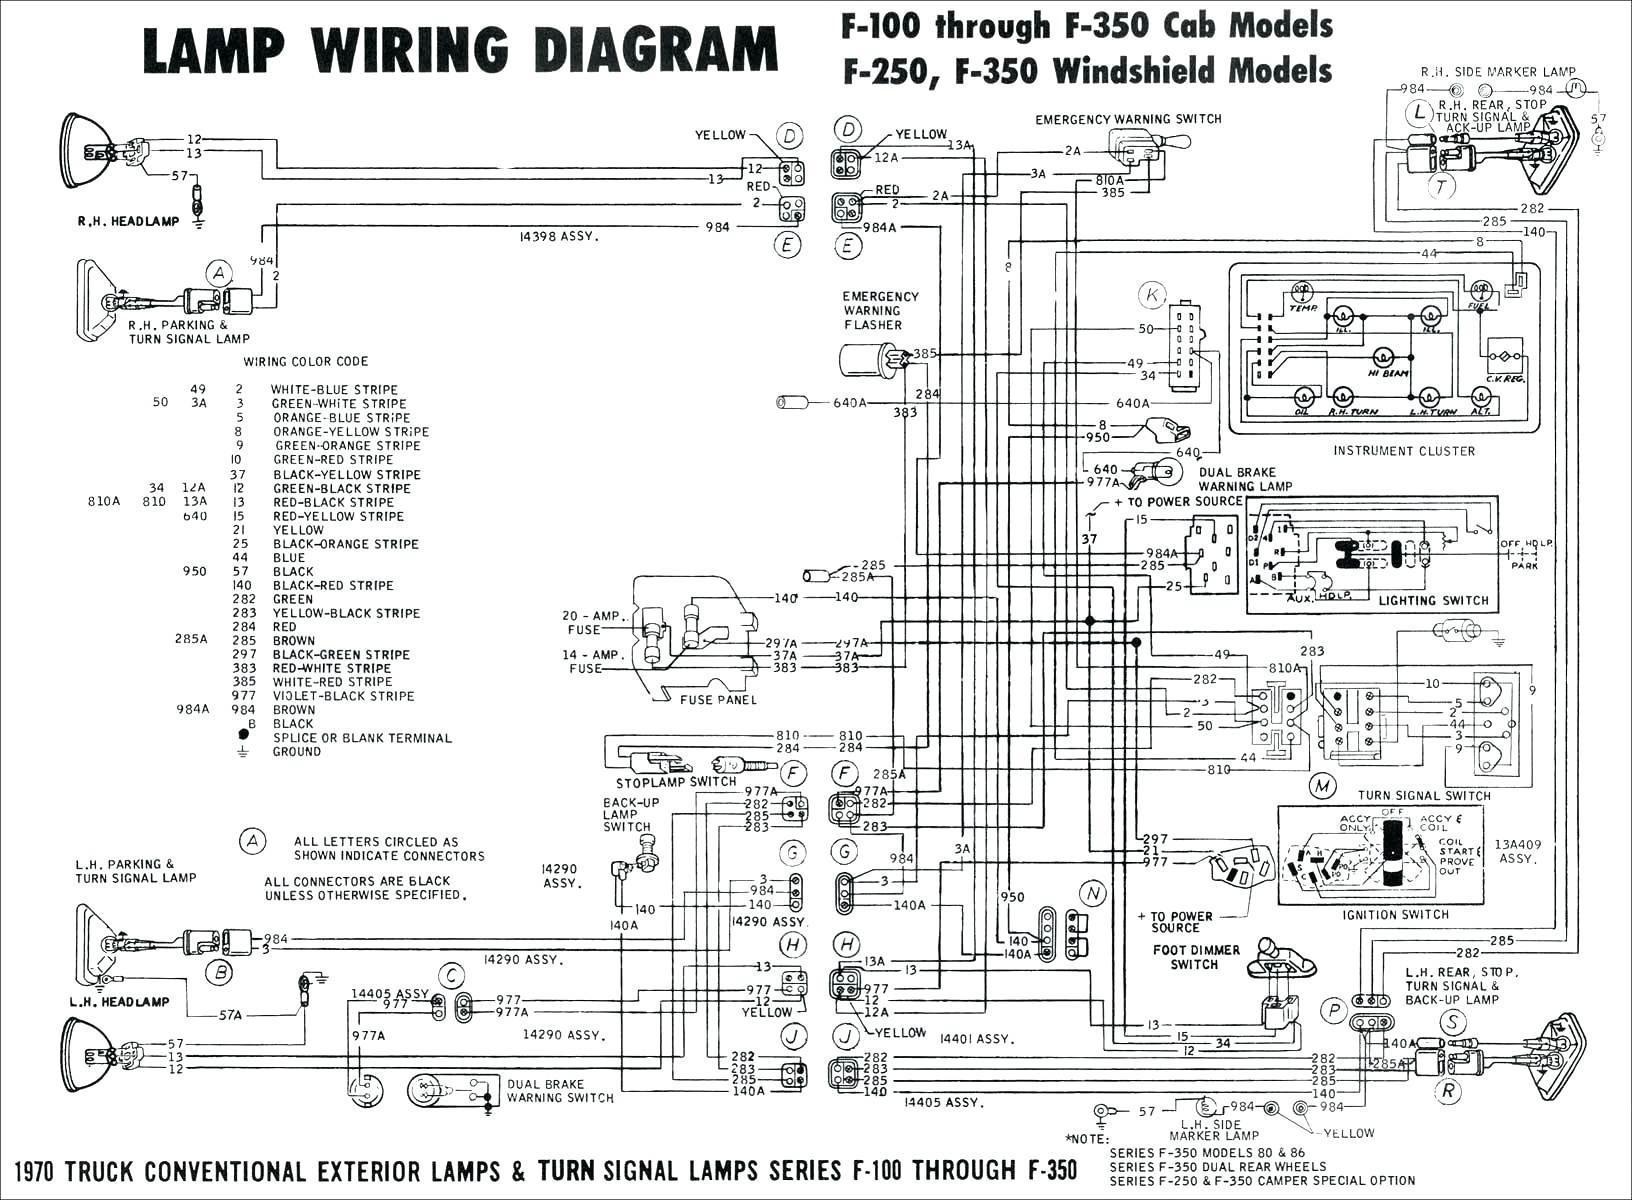 2005 Dodge Durango Radio Wiring Diagram Ke 2302] Cherokee Radio Wiring Diagram Dodge Ram 1500 Radio Of 2005 Dodge Durango Radio Wiring Diagram